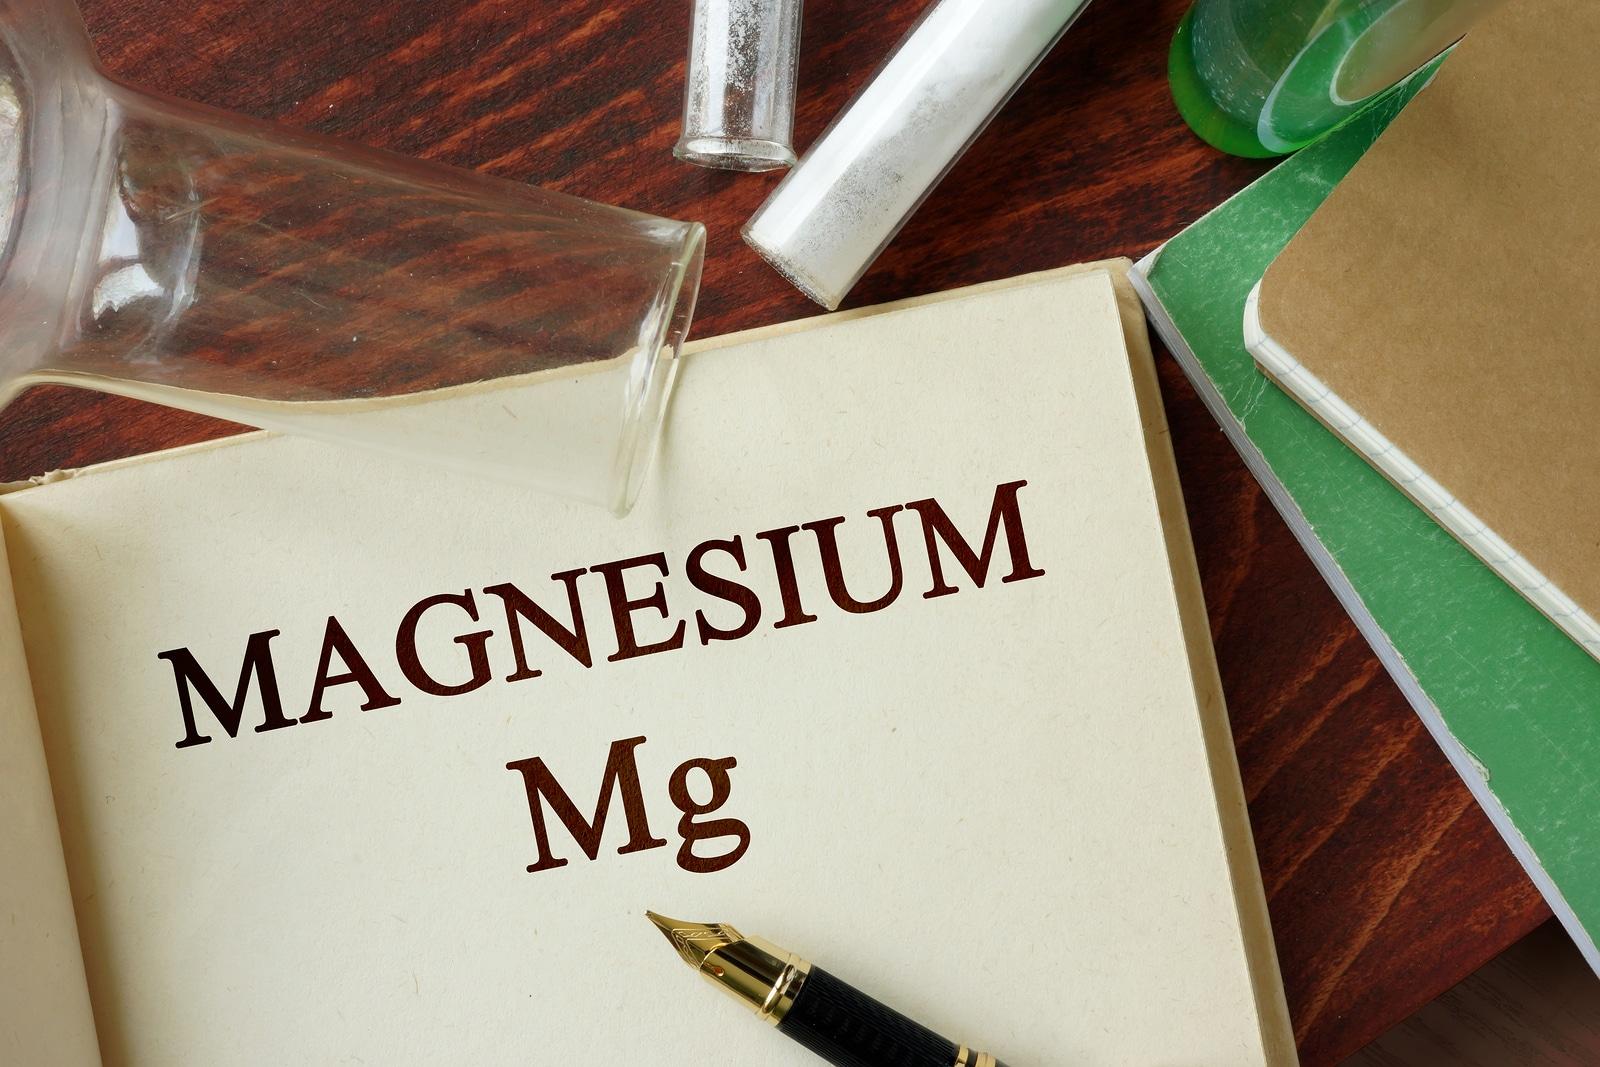 La importancia de consumir magnesio